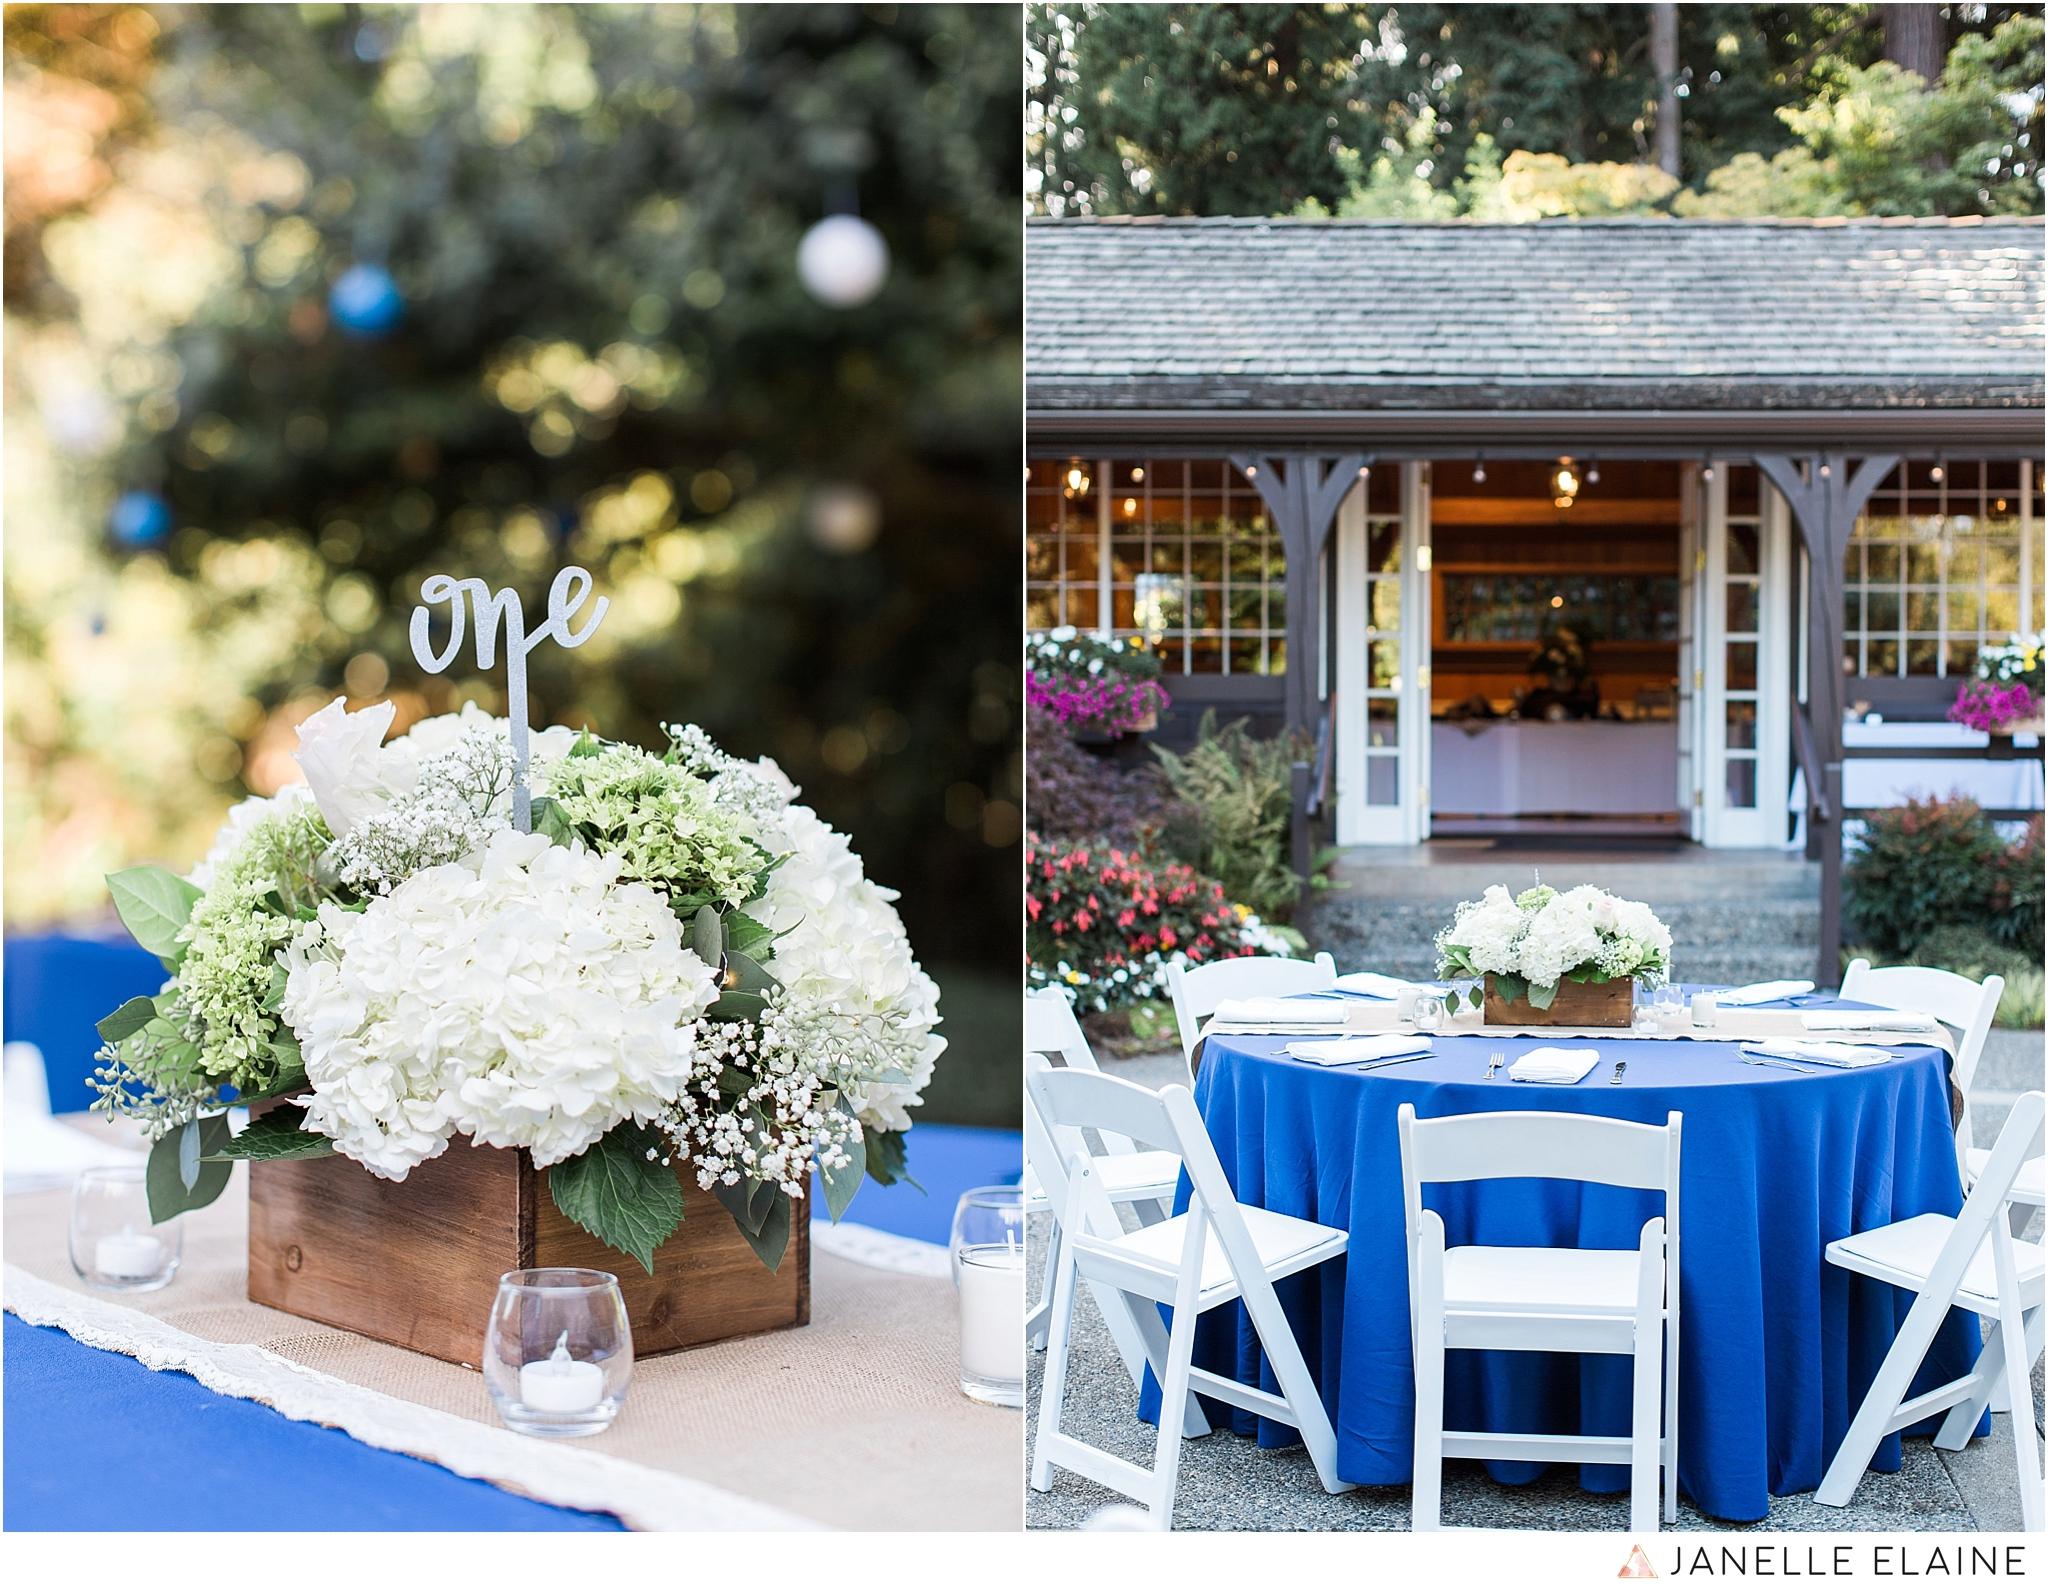 janelle elaine photography-professional wedding photographer-seattle-bellevue-robinswood house-104.jpg